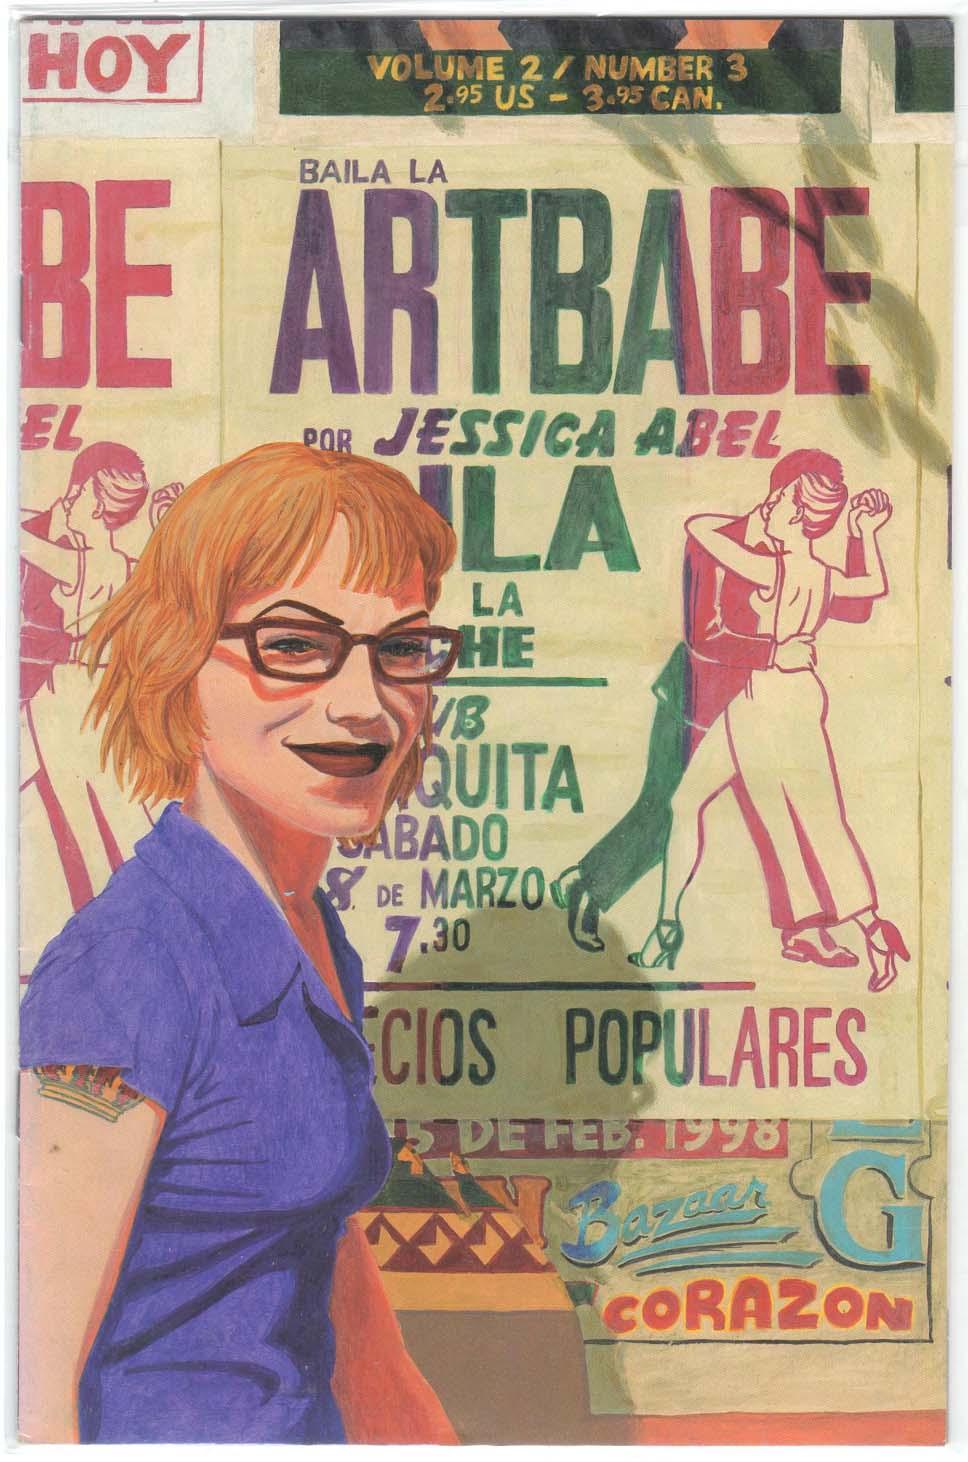 Artbabe (1997) #3